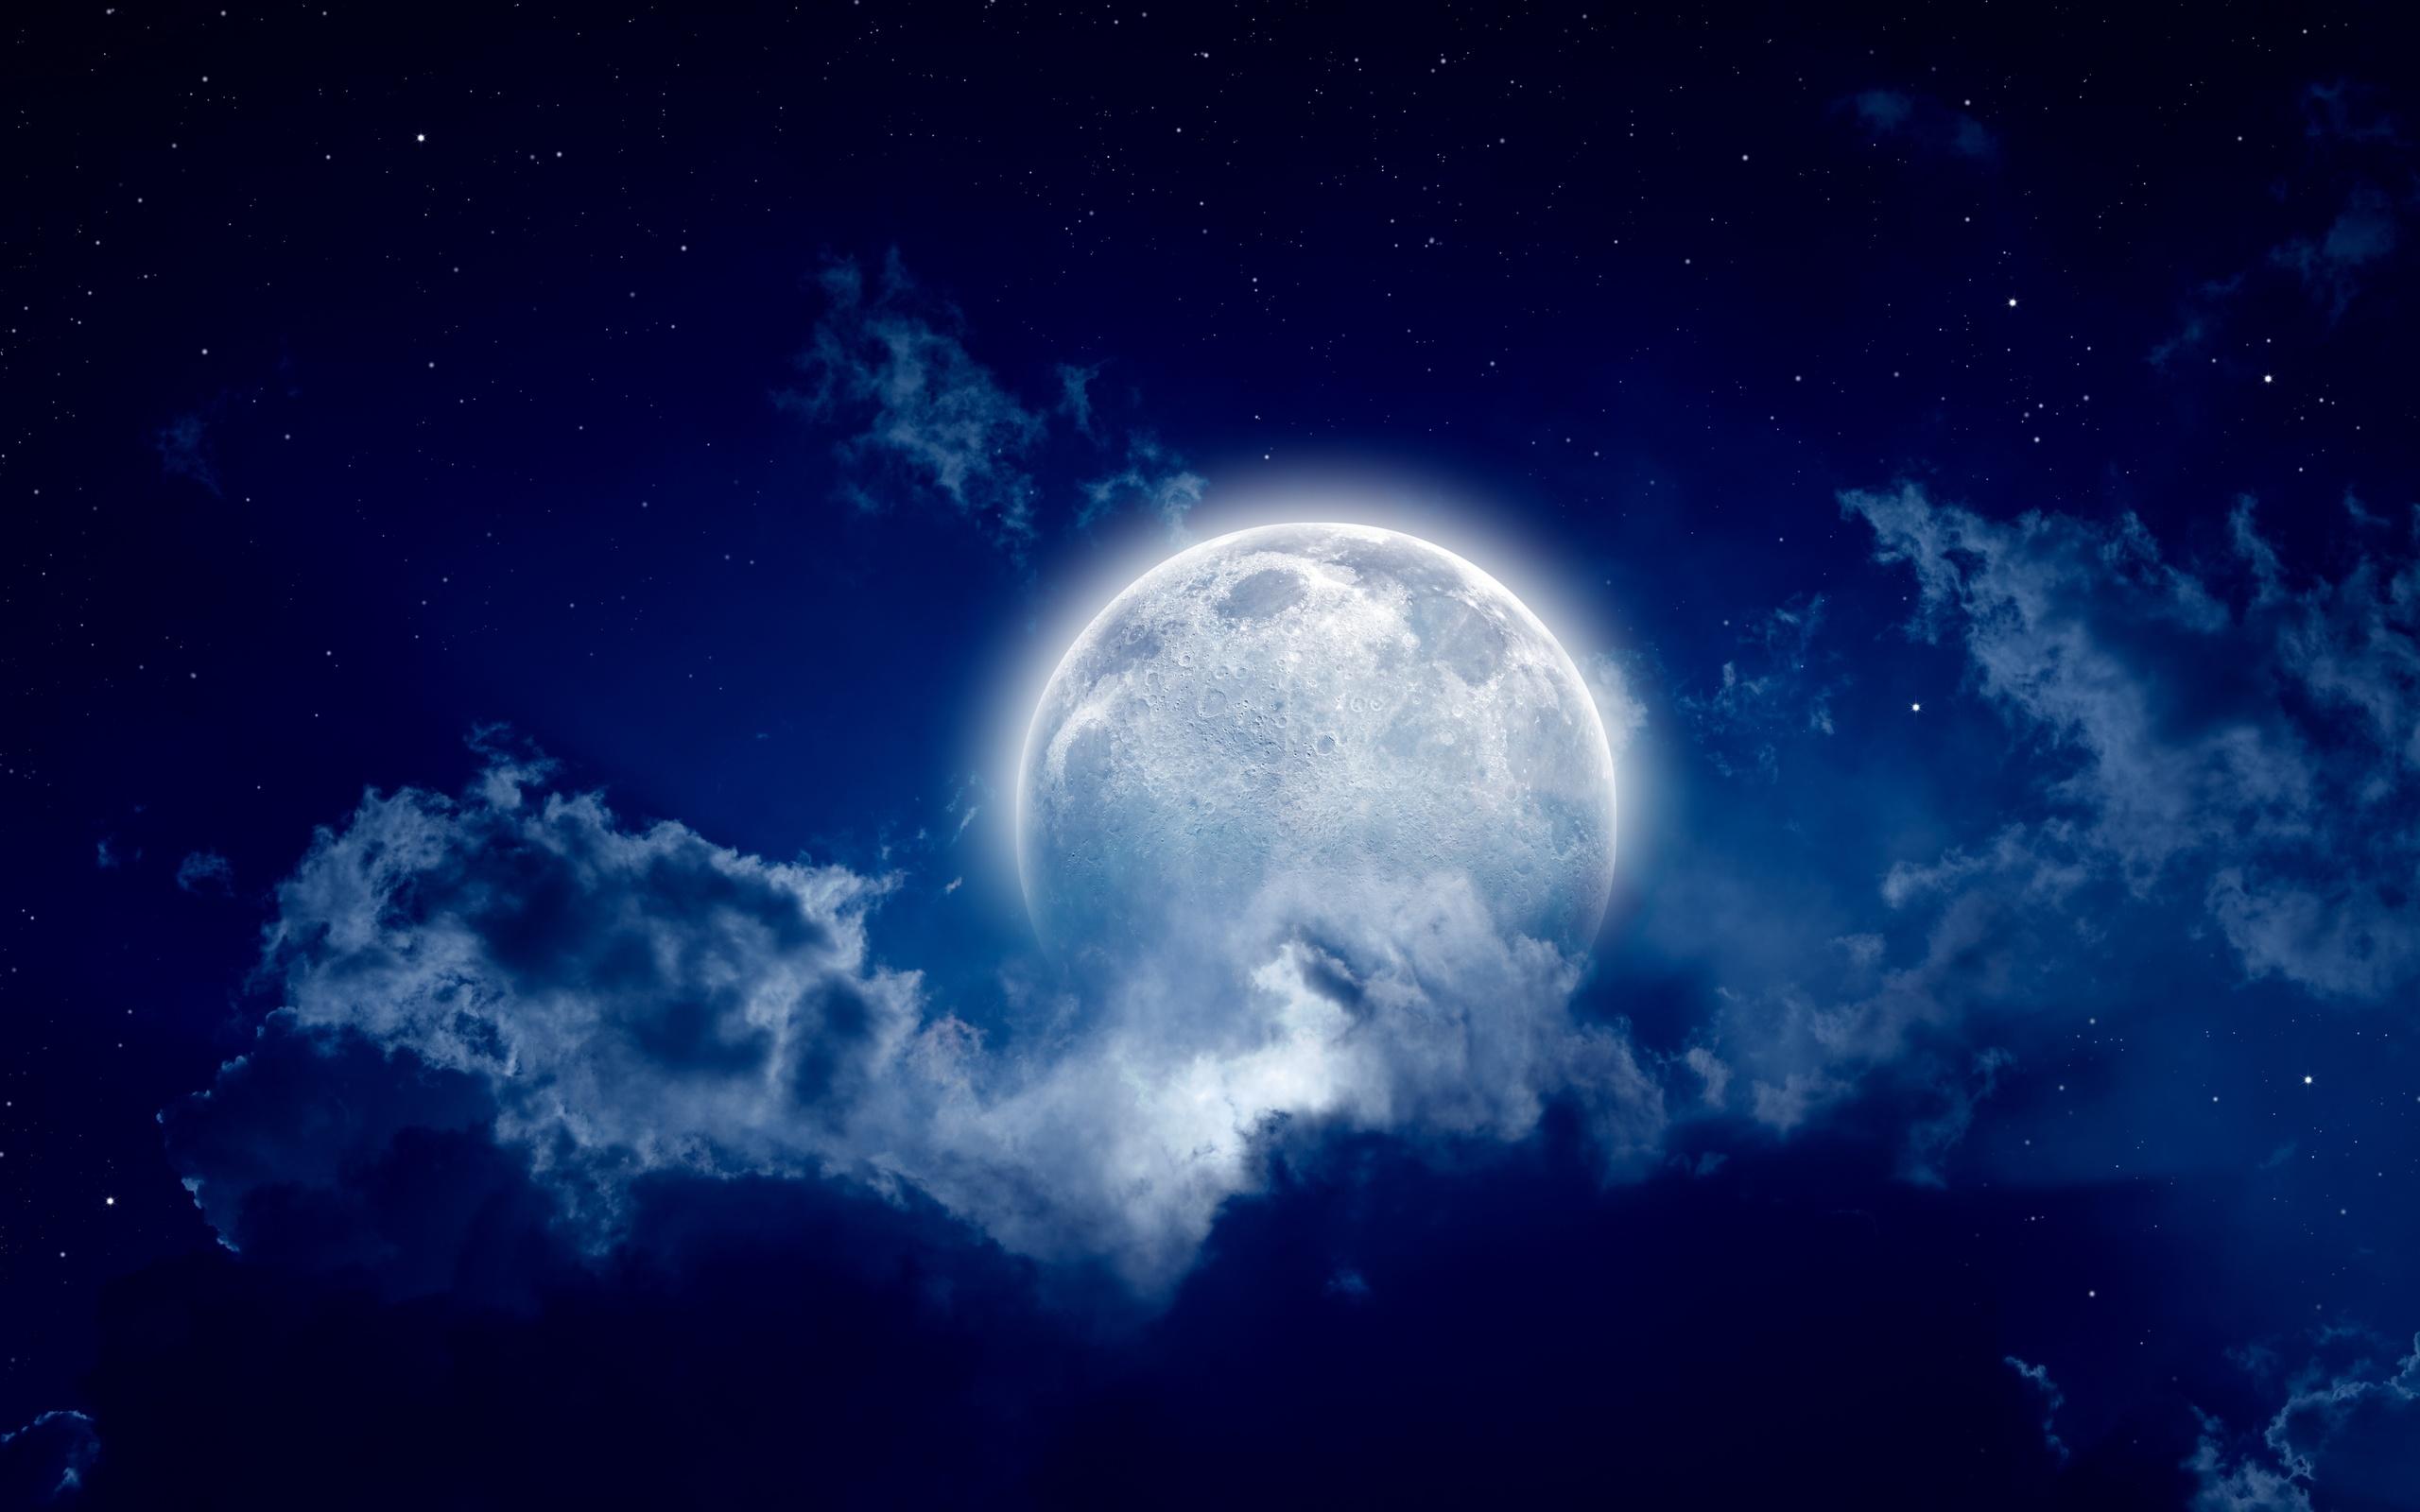 Картинки красивые про луну